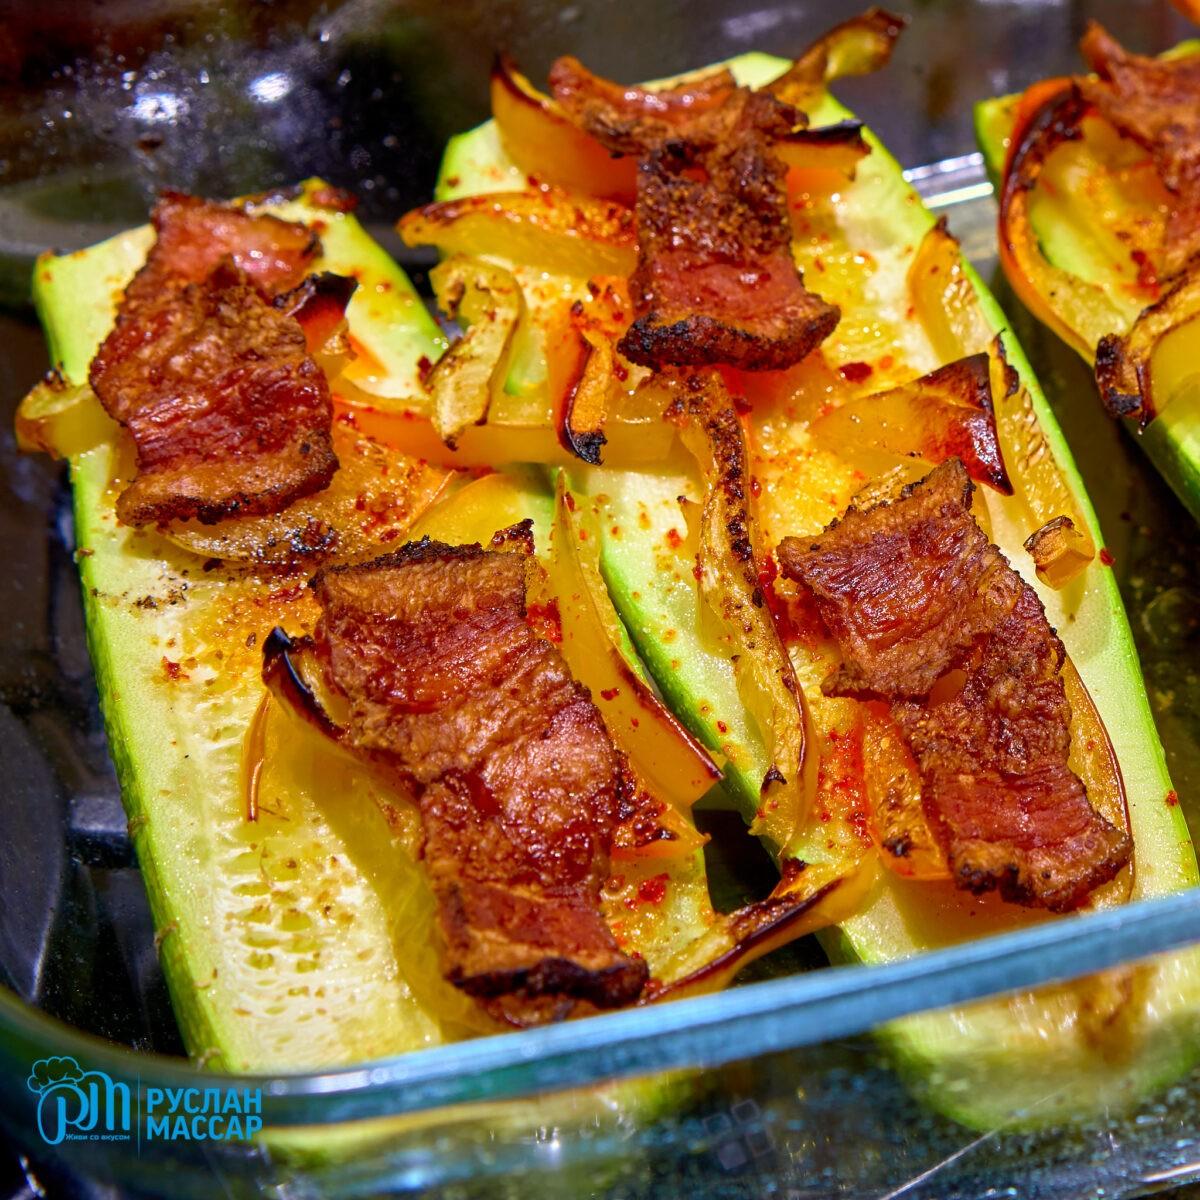 You are currently viewing Кабачки в духовке с беконом и сладким перцем.